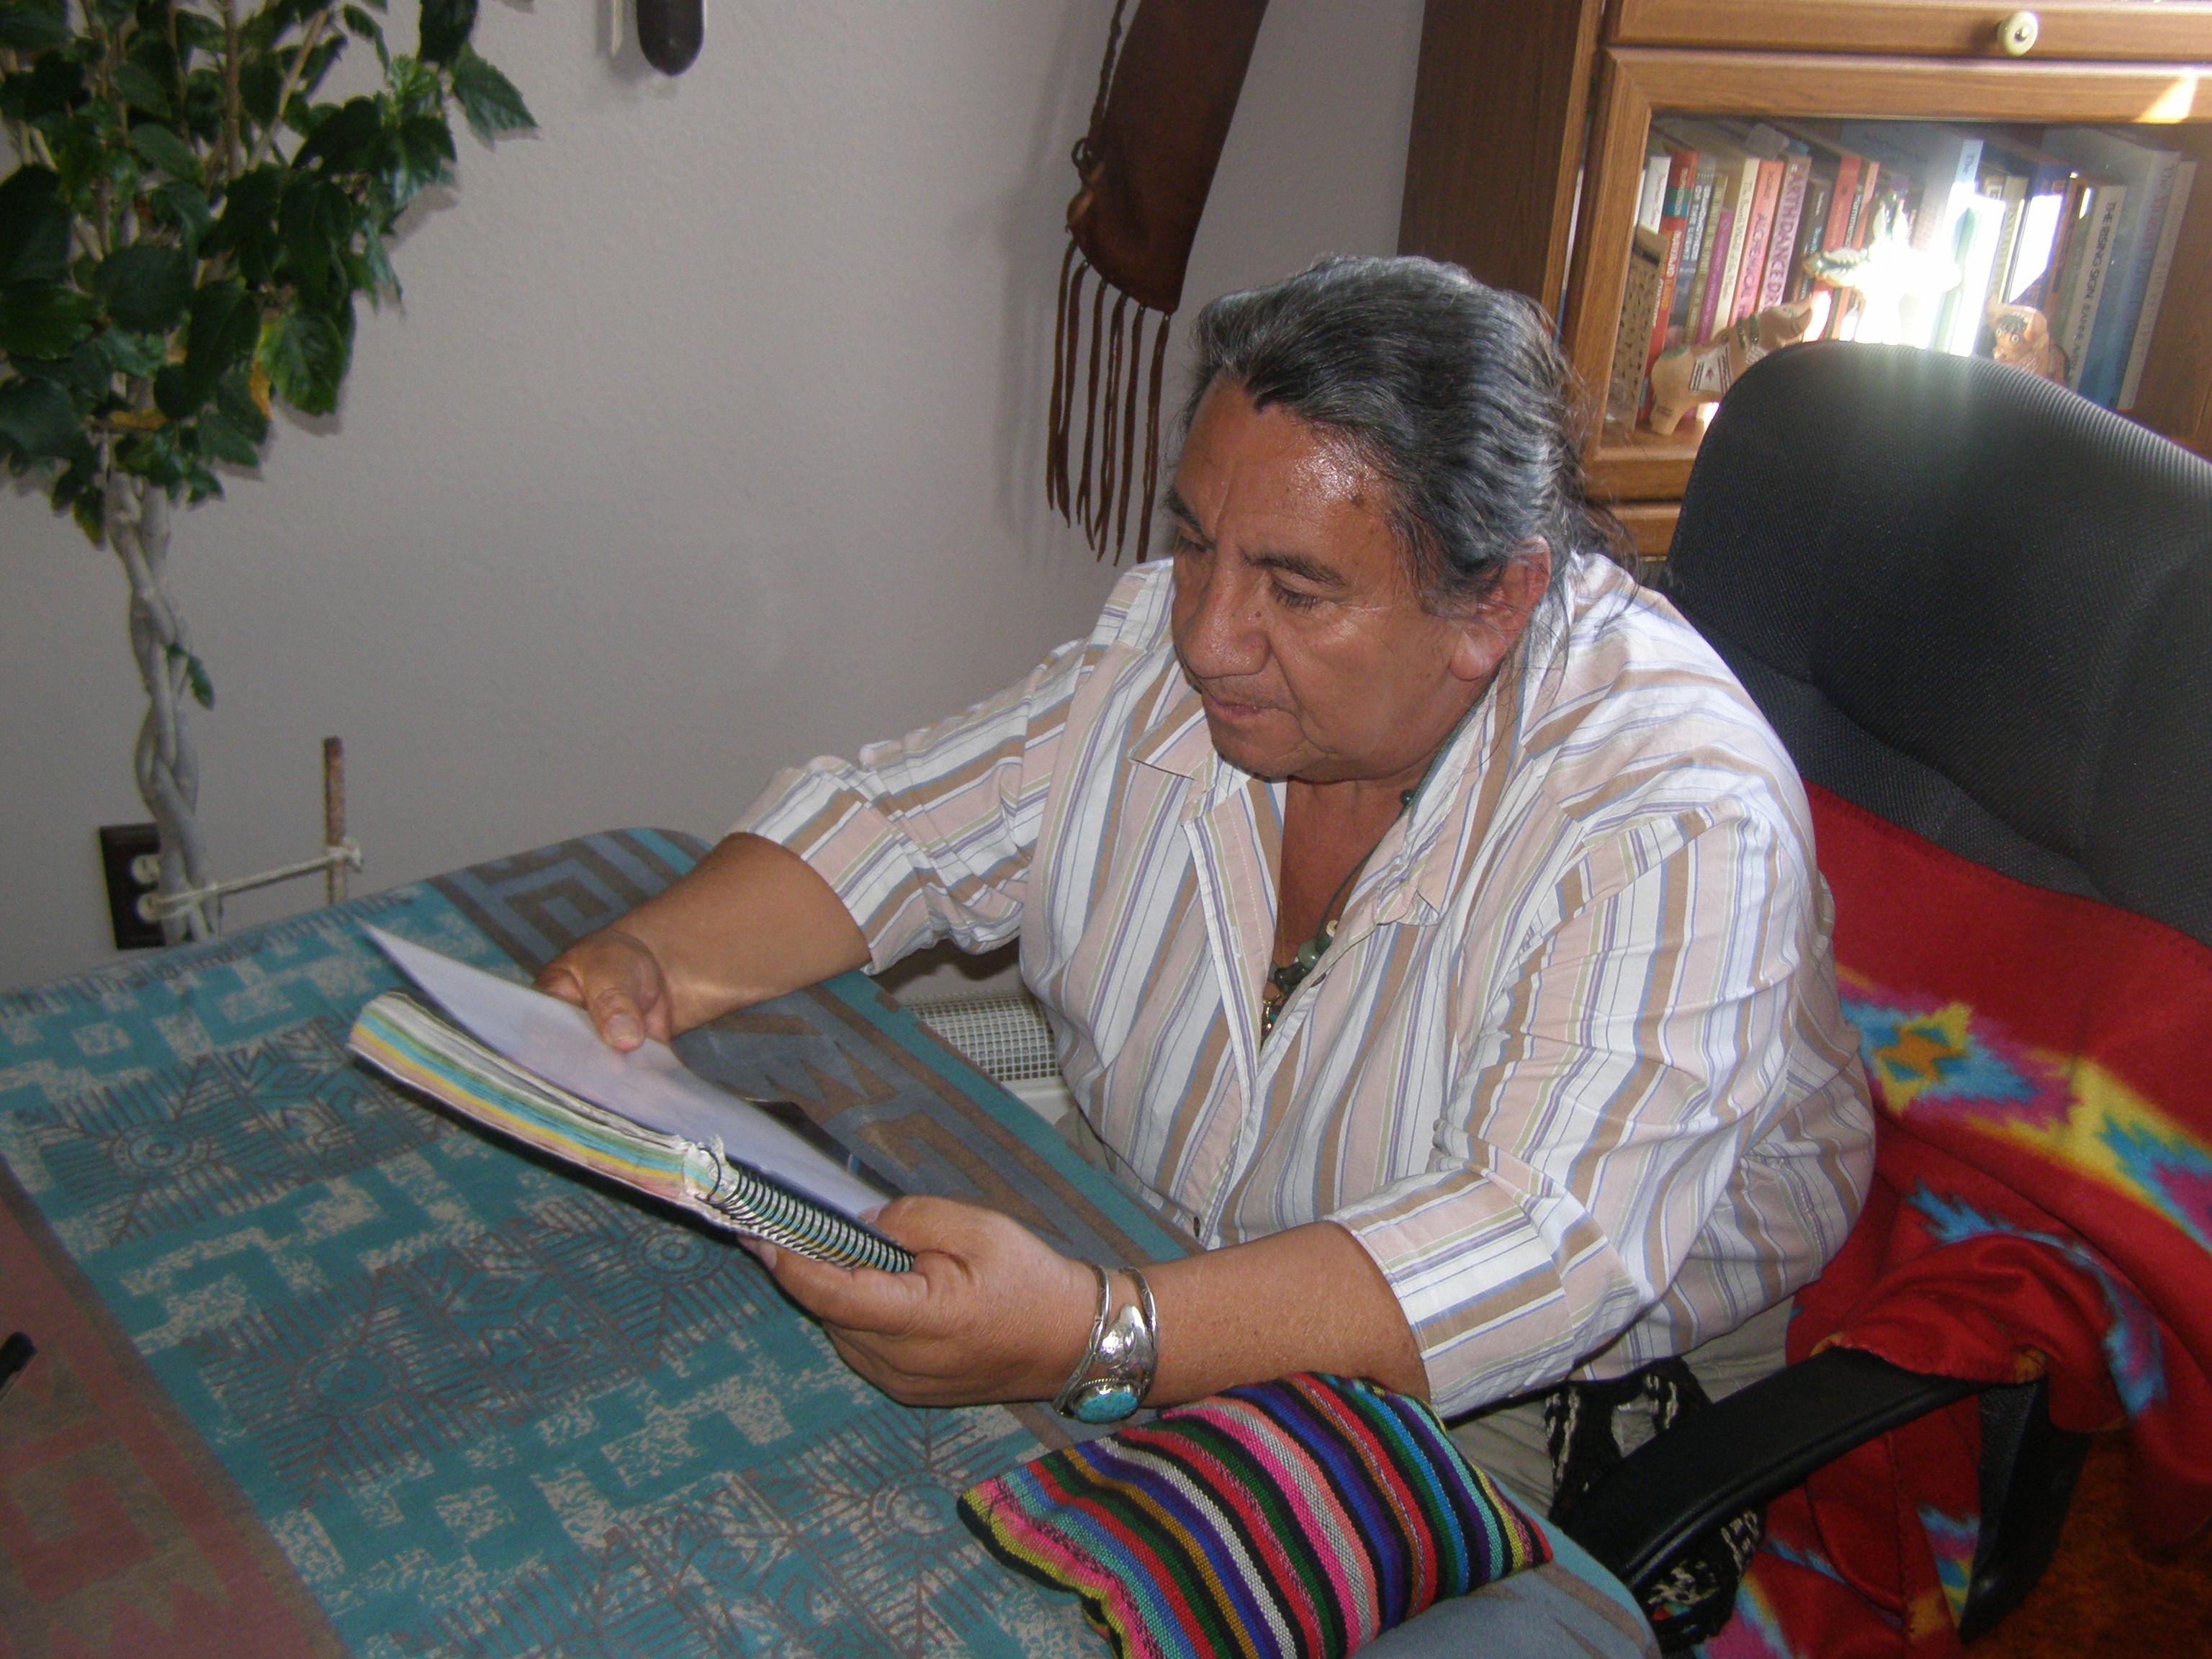 Mayan elder returns to squash doomsday rumors | CSU-Pueblo Today